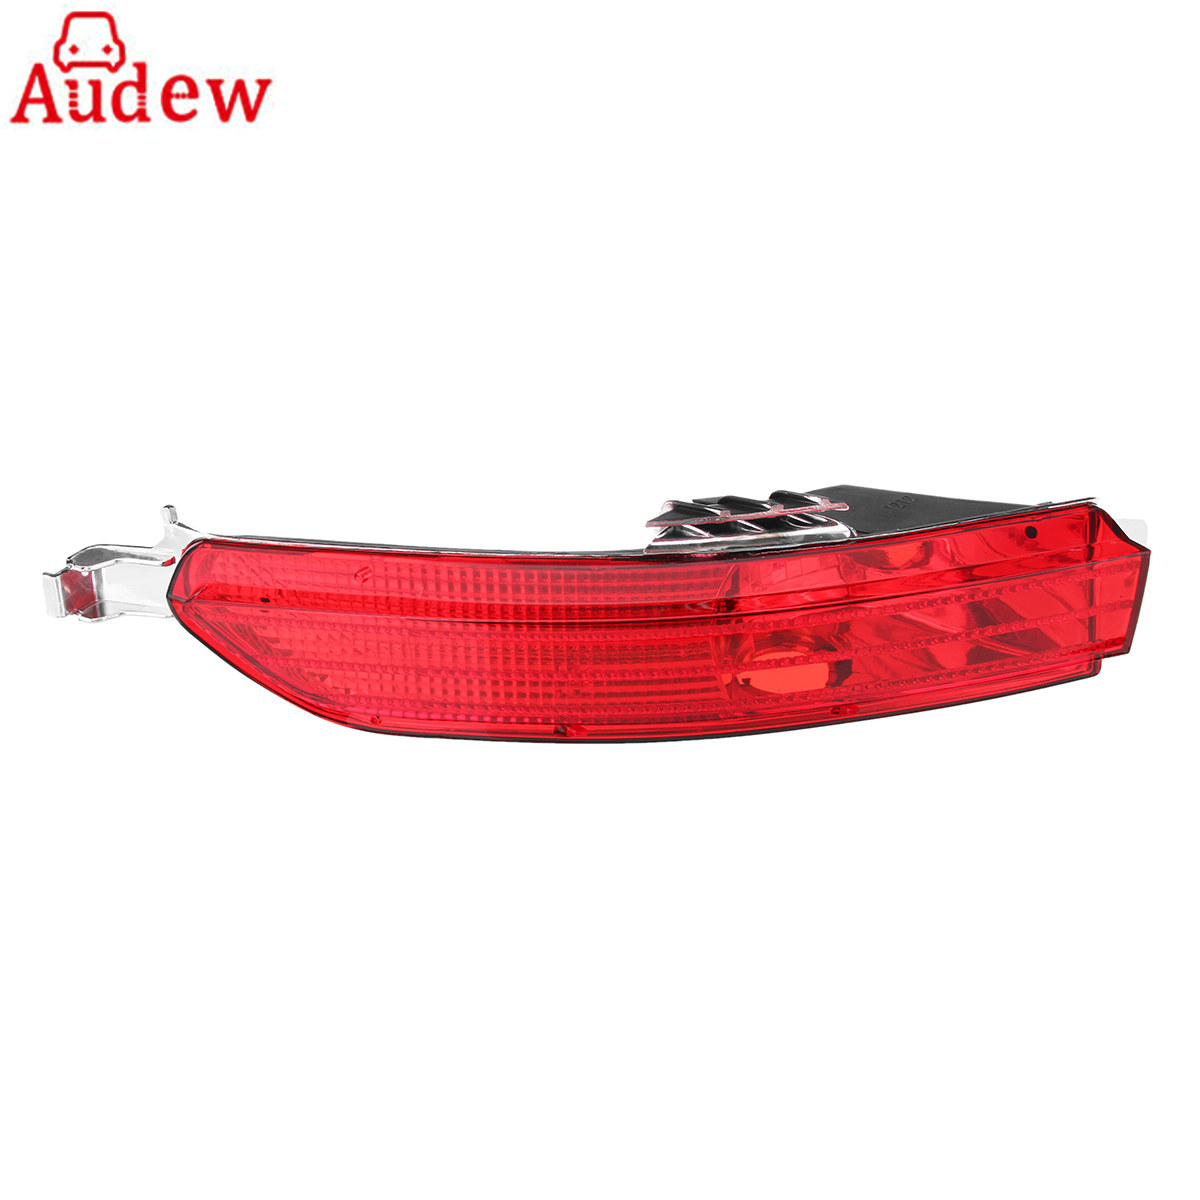 1Pcs Red Car Tail Light Turn Signal Lamp Left Rear Bumper Red Fog Light For VW TOUAREG 11-14 pai transporter t4 caravelle smoked red tail rear light lamp for vw left